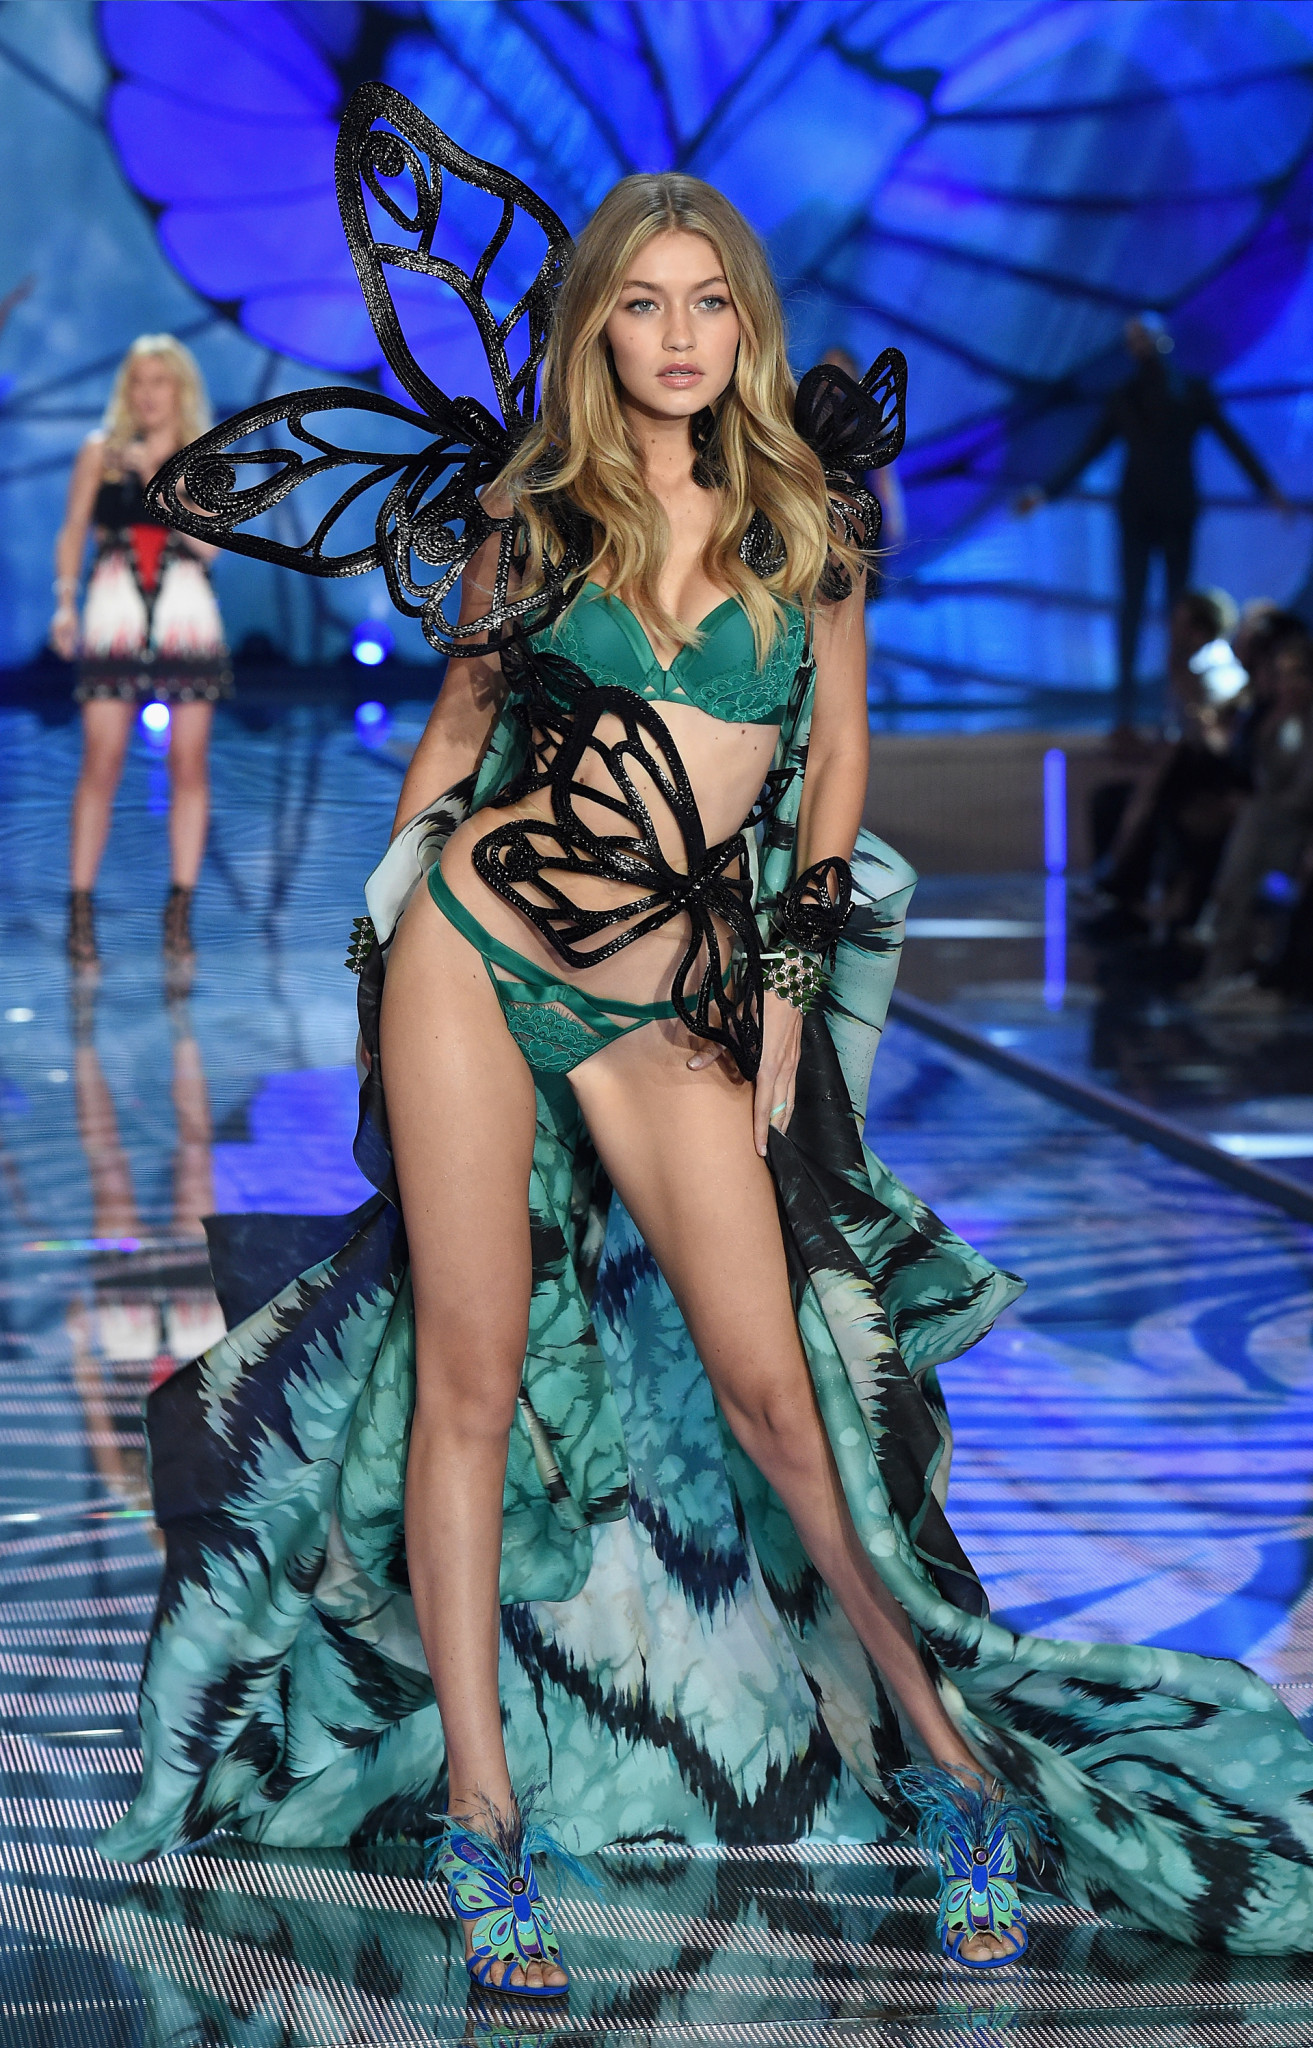 NEW YORK, NY - NOVEMBER 10: Model Gigi Hadid walks the runway during the 2015 Victoria's Secret Fashion Show